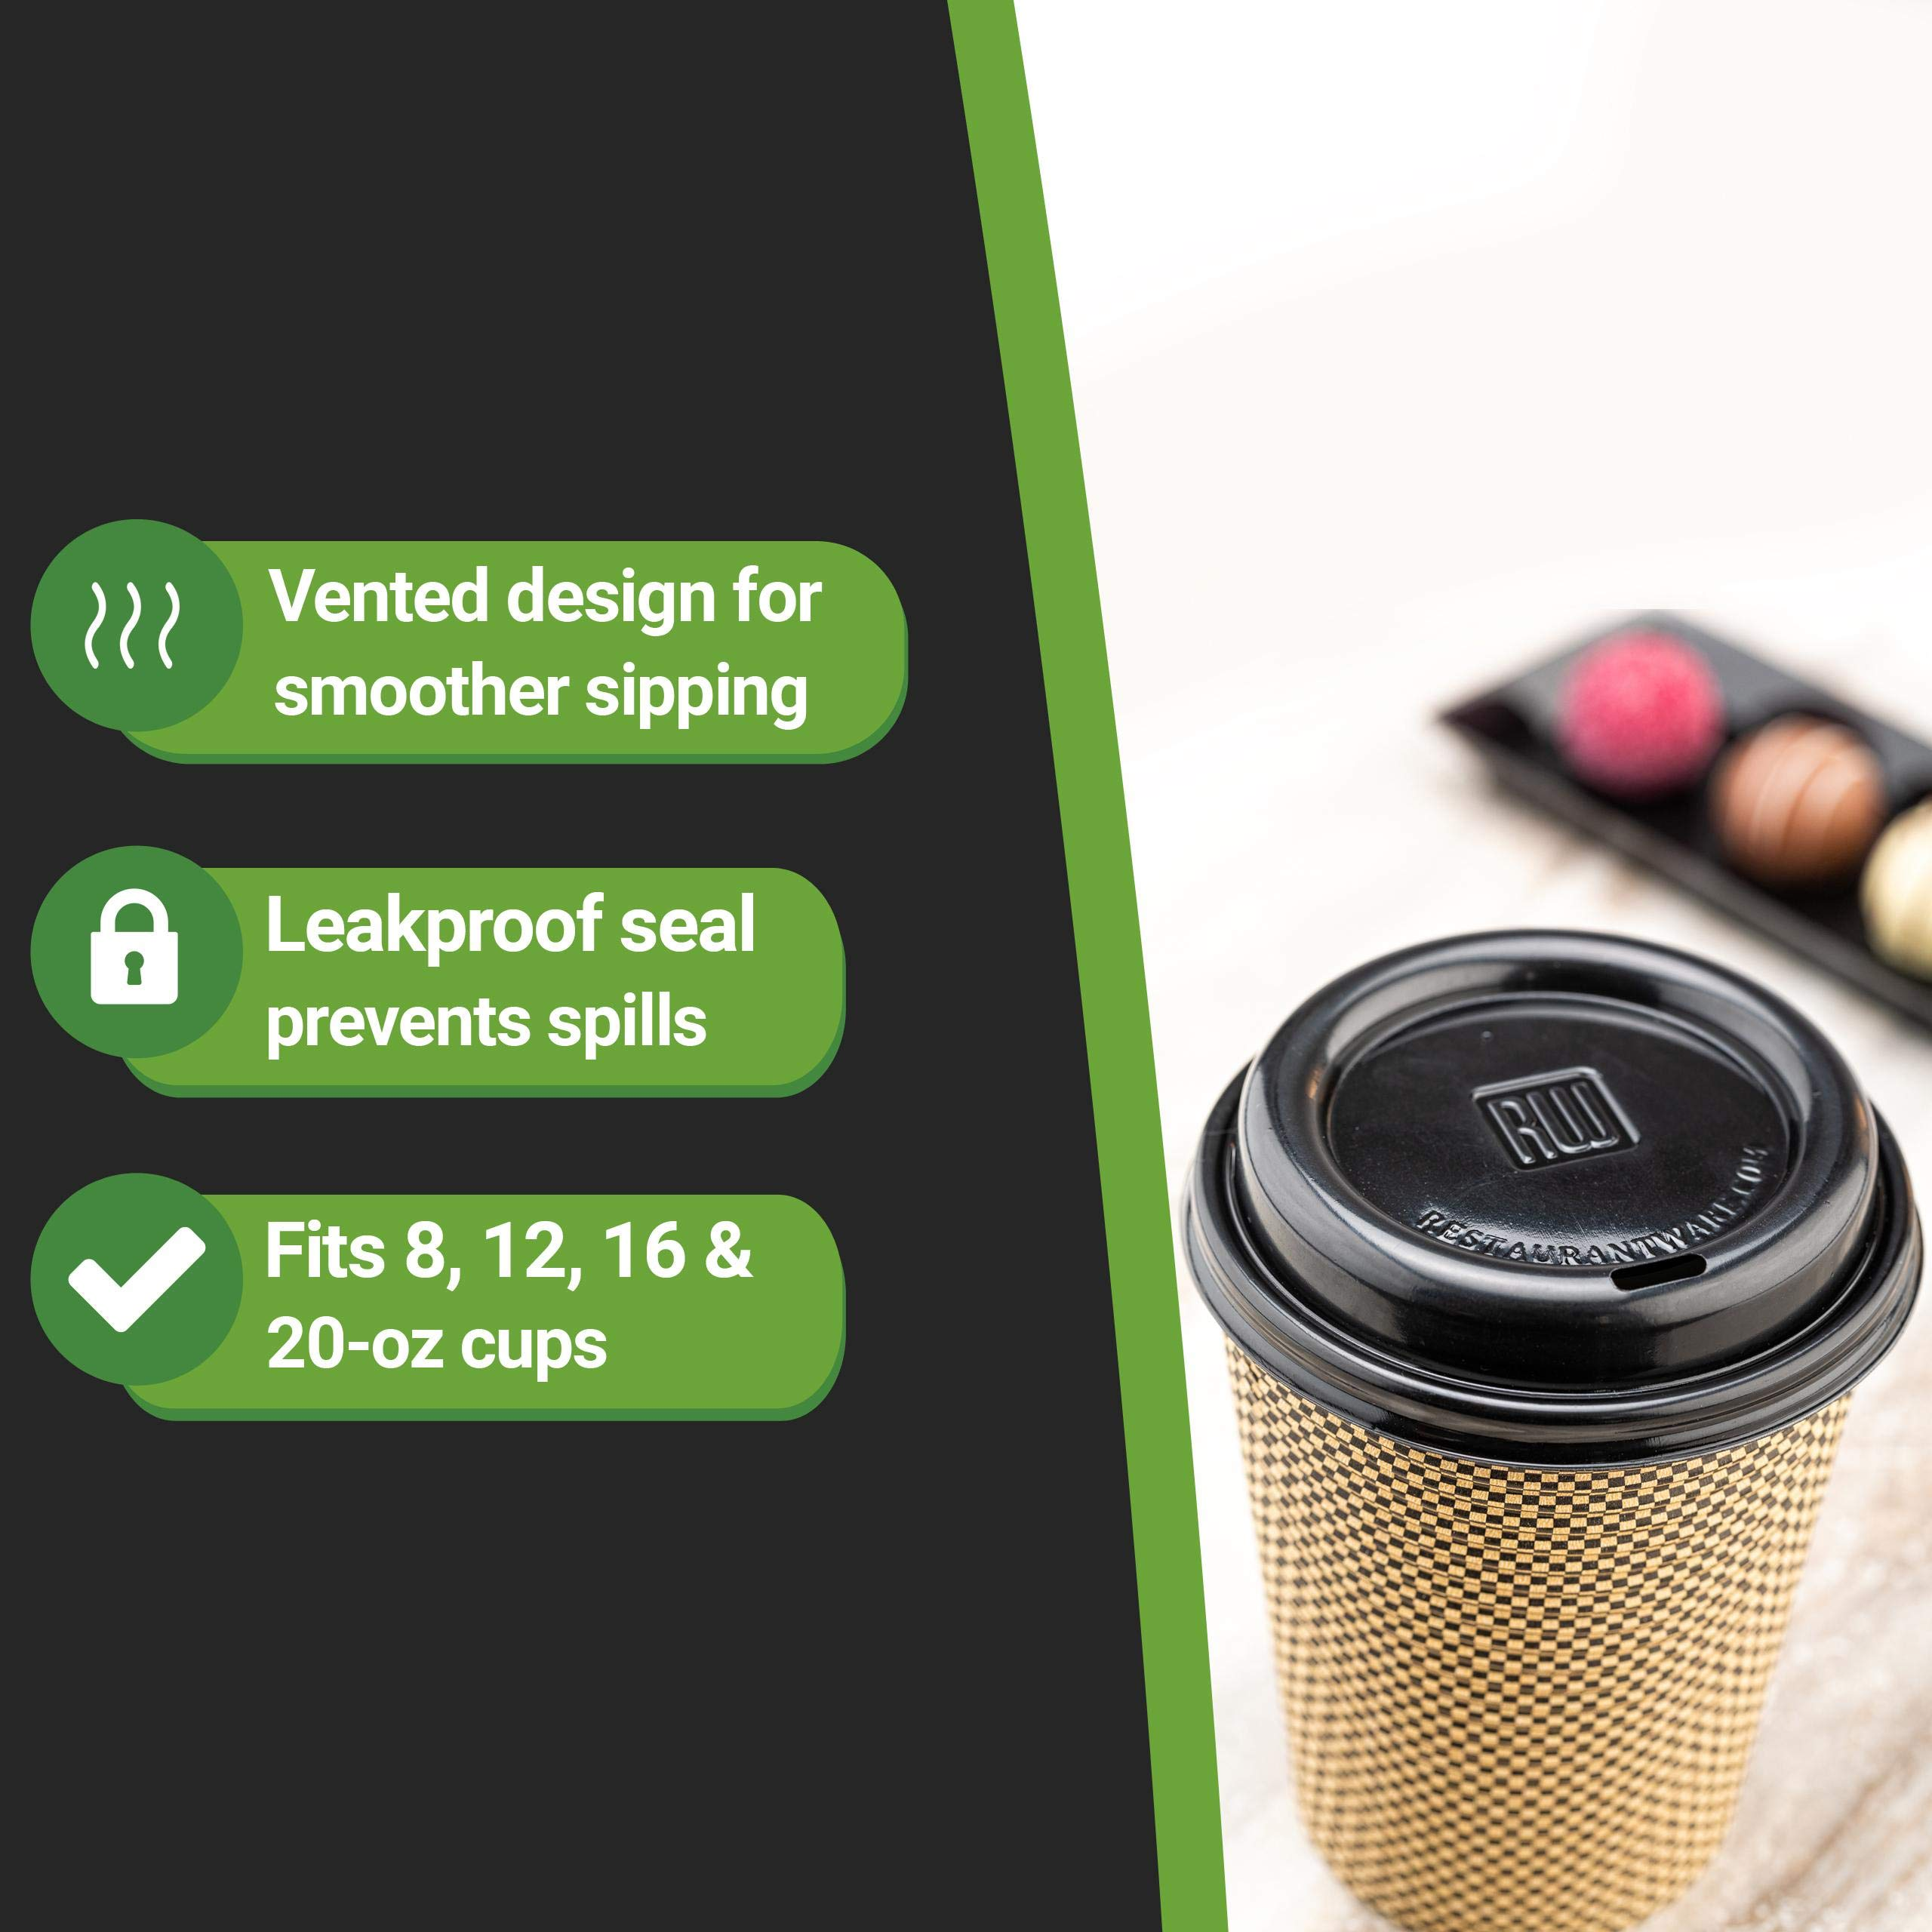 Restpresso Black Plastic Coffee Cup Lid Fits 8, 12, 16 and 20 oz 500 count box Restaurantware